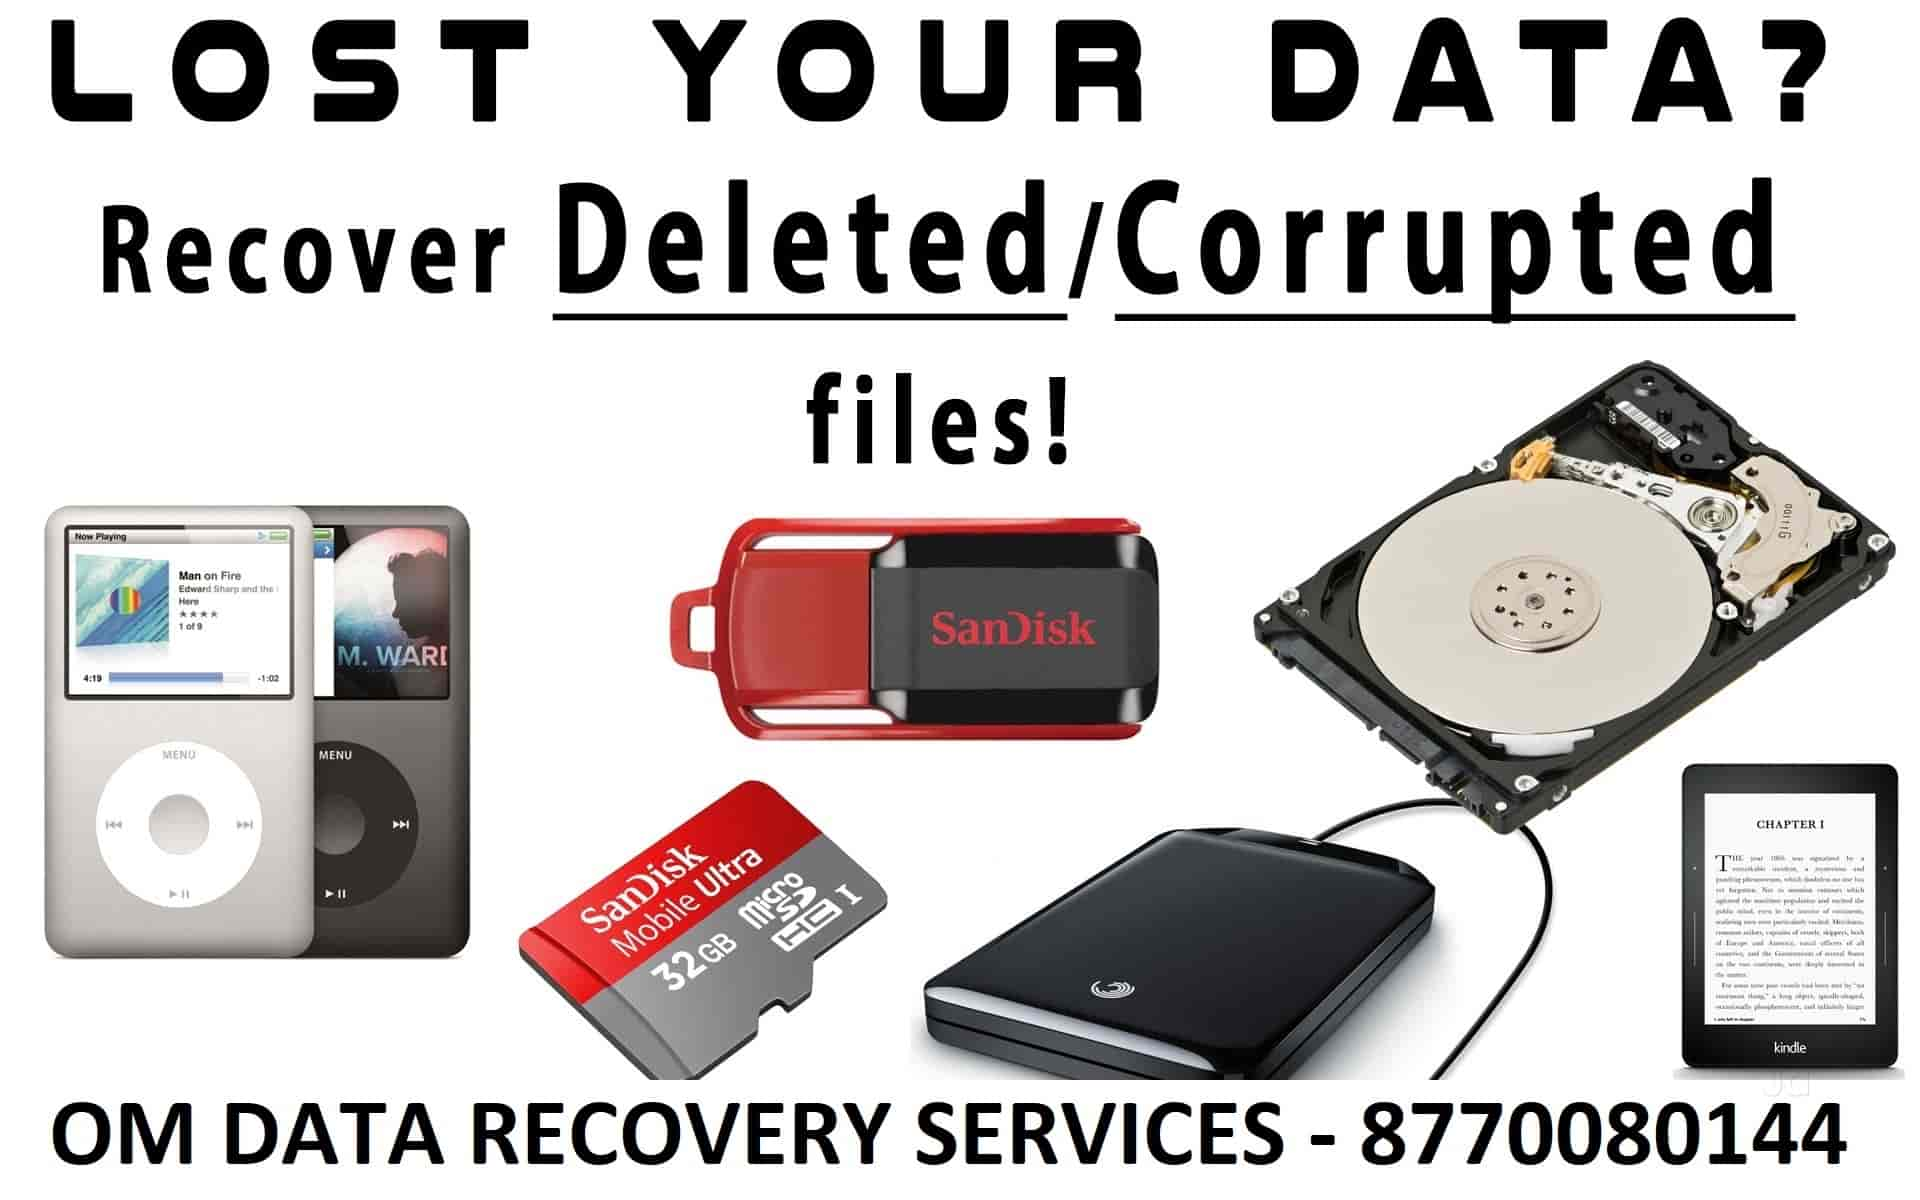 https://www.salvagedata.com/usb-flash-drive-recovery/